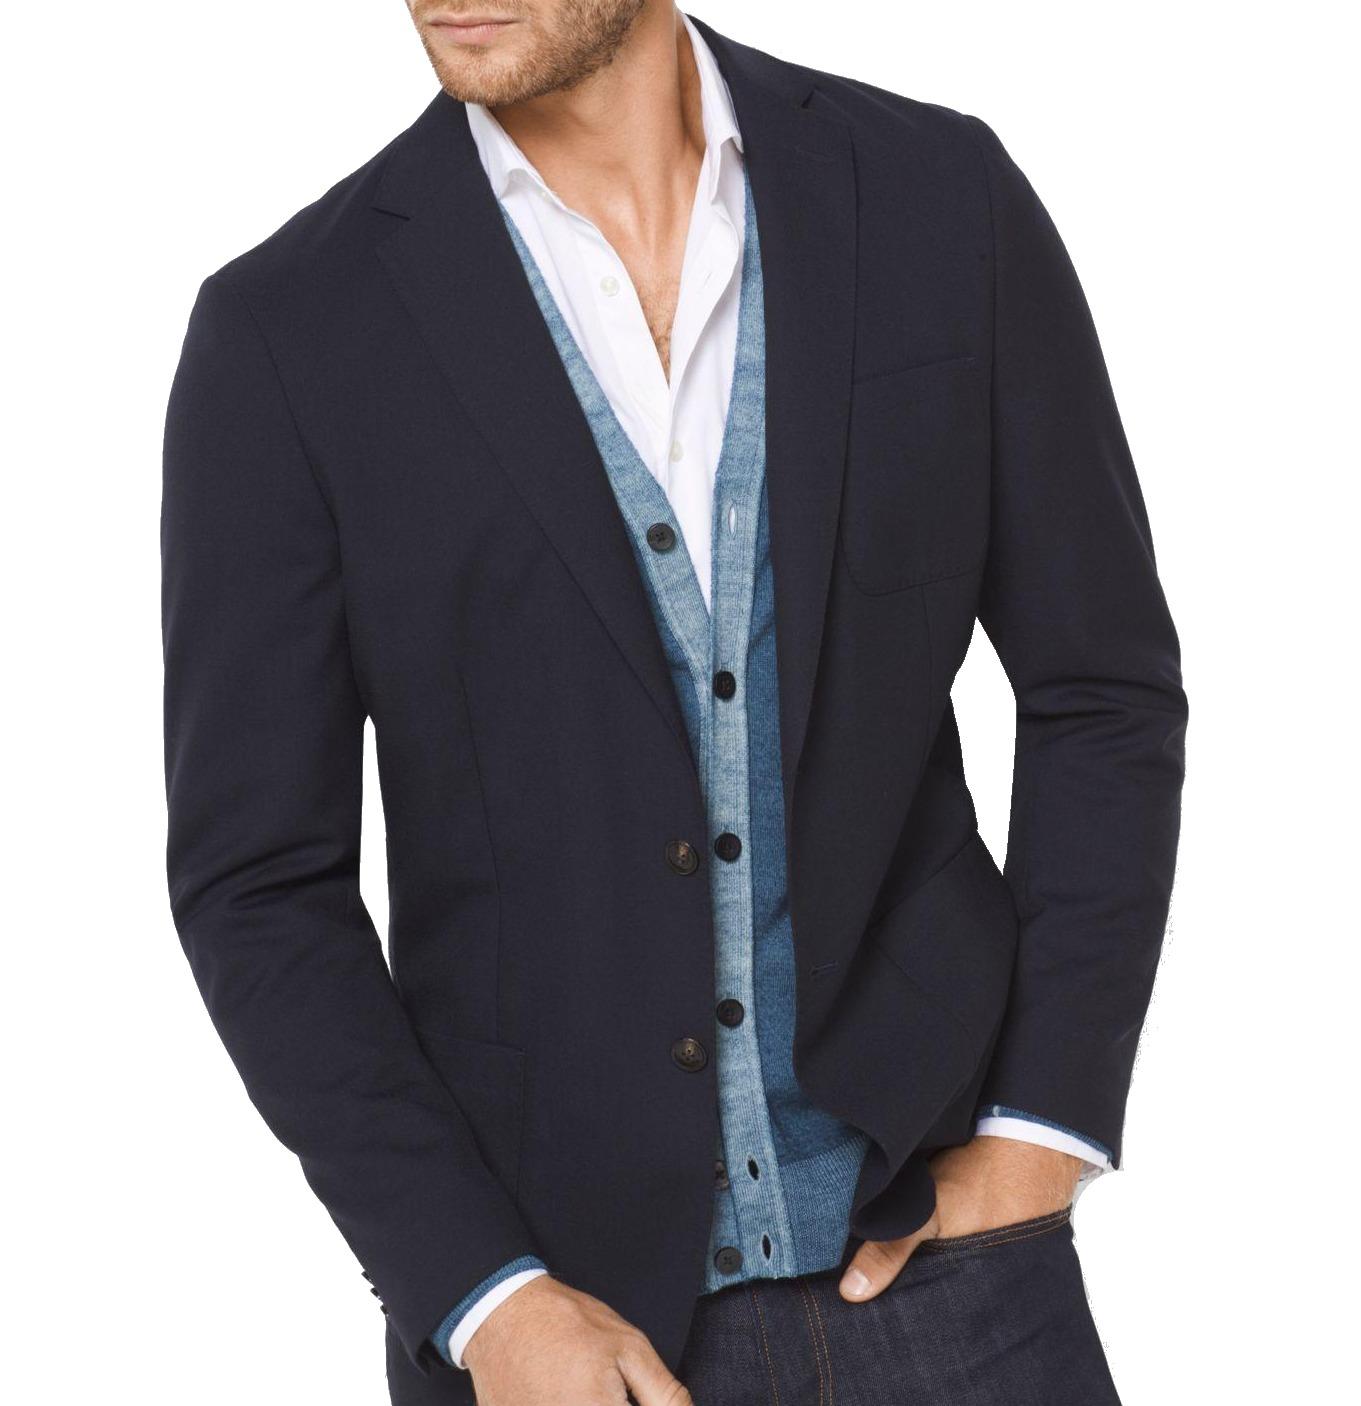 Michael Kors NEW Midnight Blue Mens Size 44 Two Button Wool Blazer